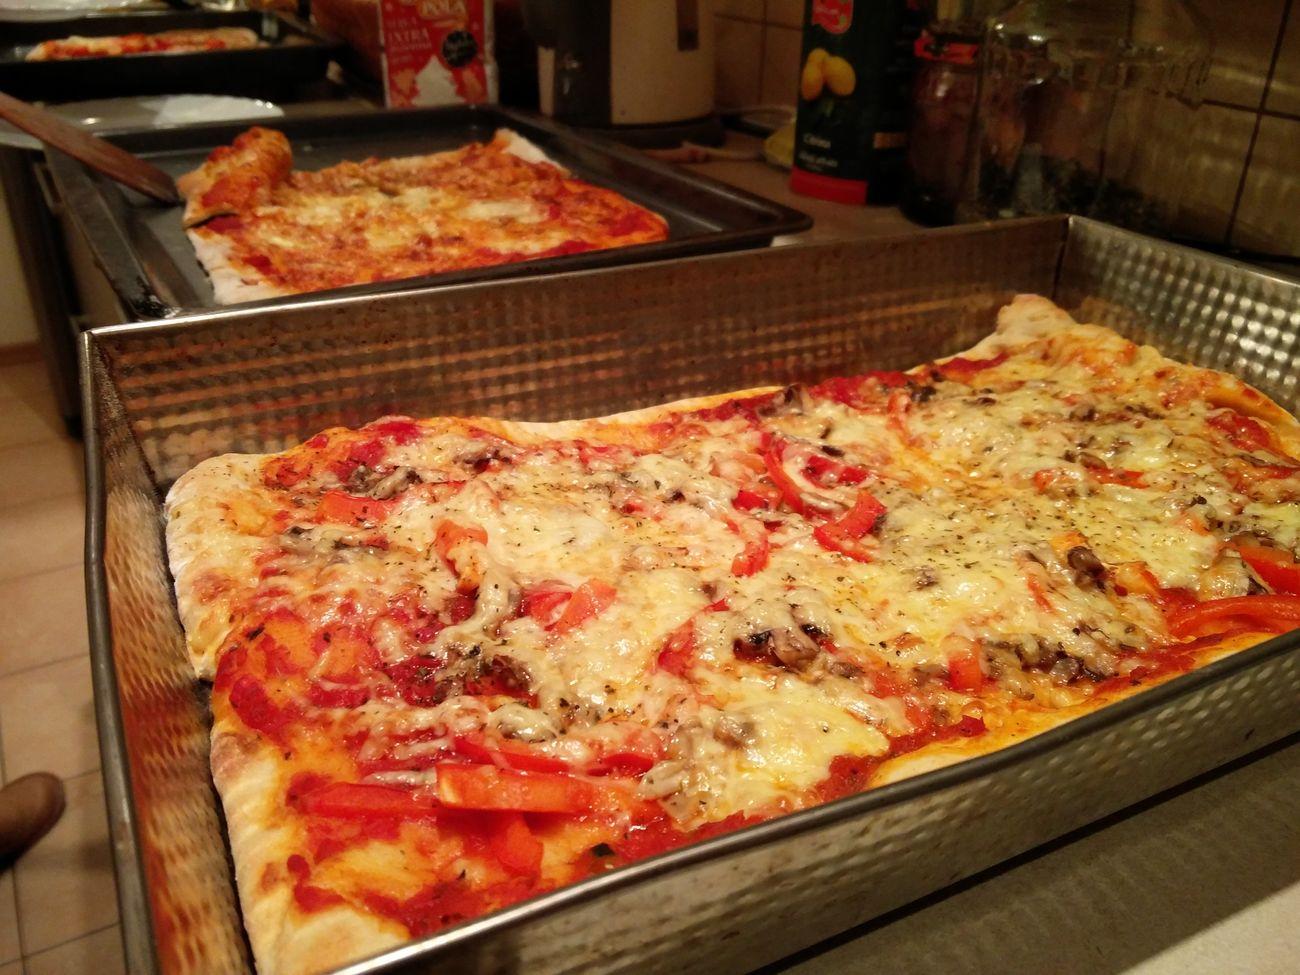 Pizza Food Indoors  Pizza🍕 Pizzalover🍕🍕🍕 Pizzaparty Pizzanight🍕 Vilnius Christmas Vegetarian Food Vegetarian Pizza Love Pizza Porn Foodporn Foodporn❤️ Foodpics Food♡